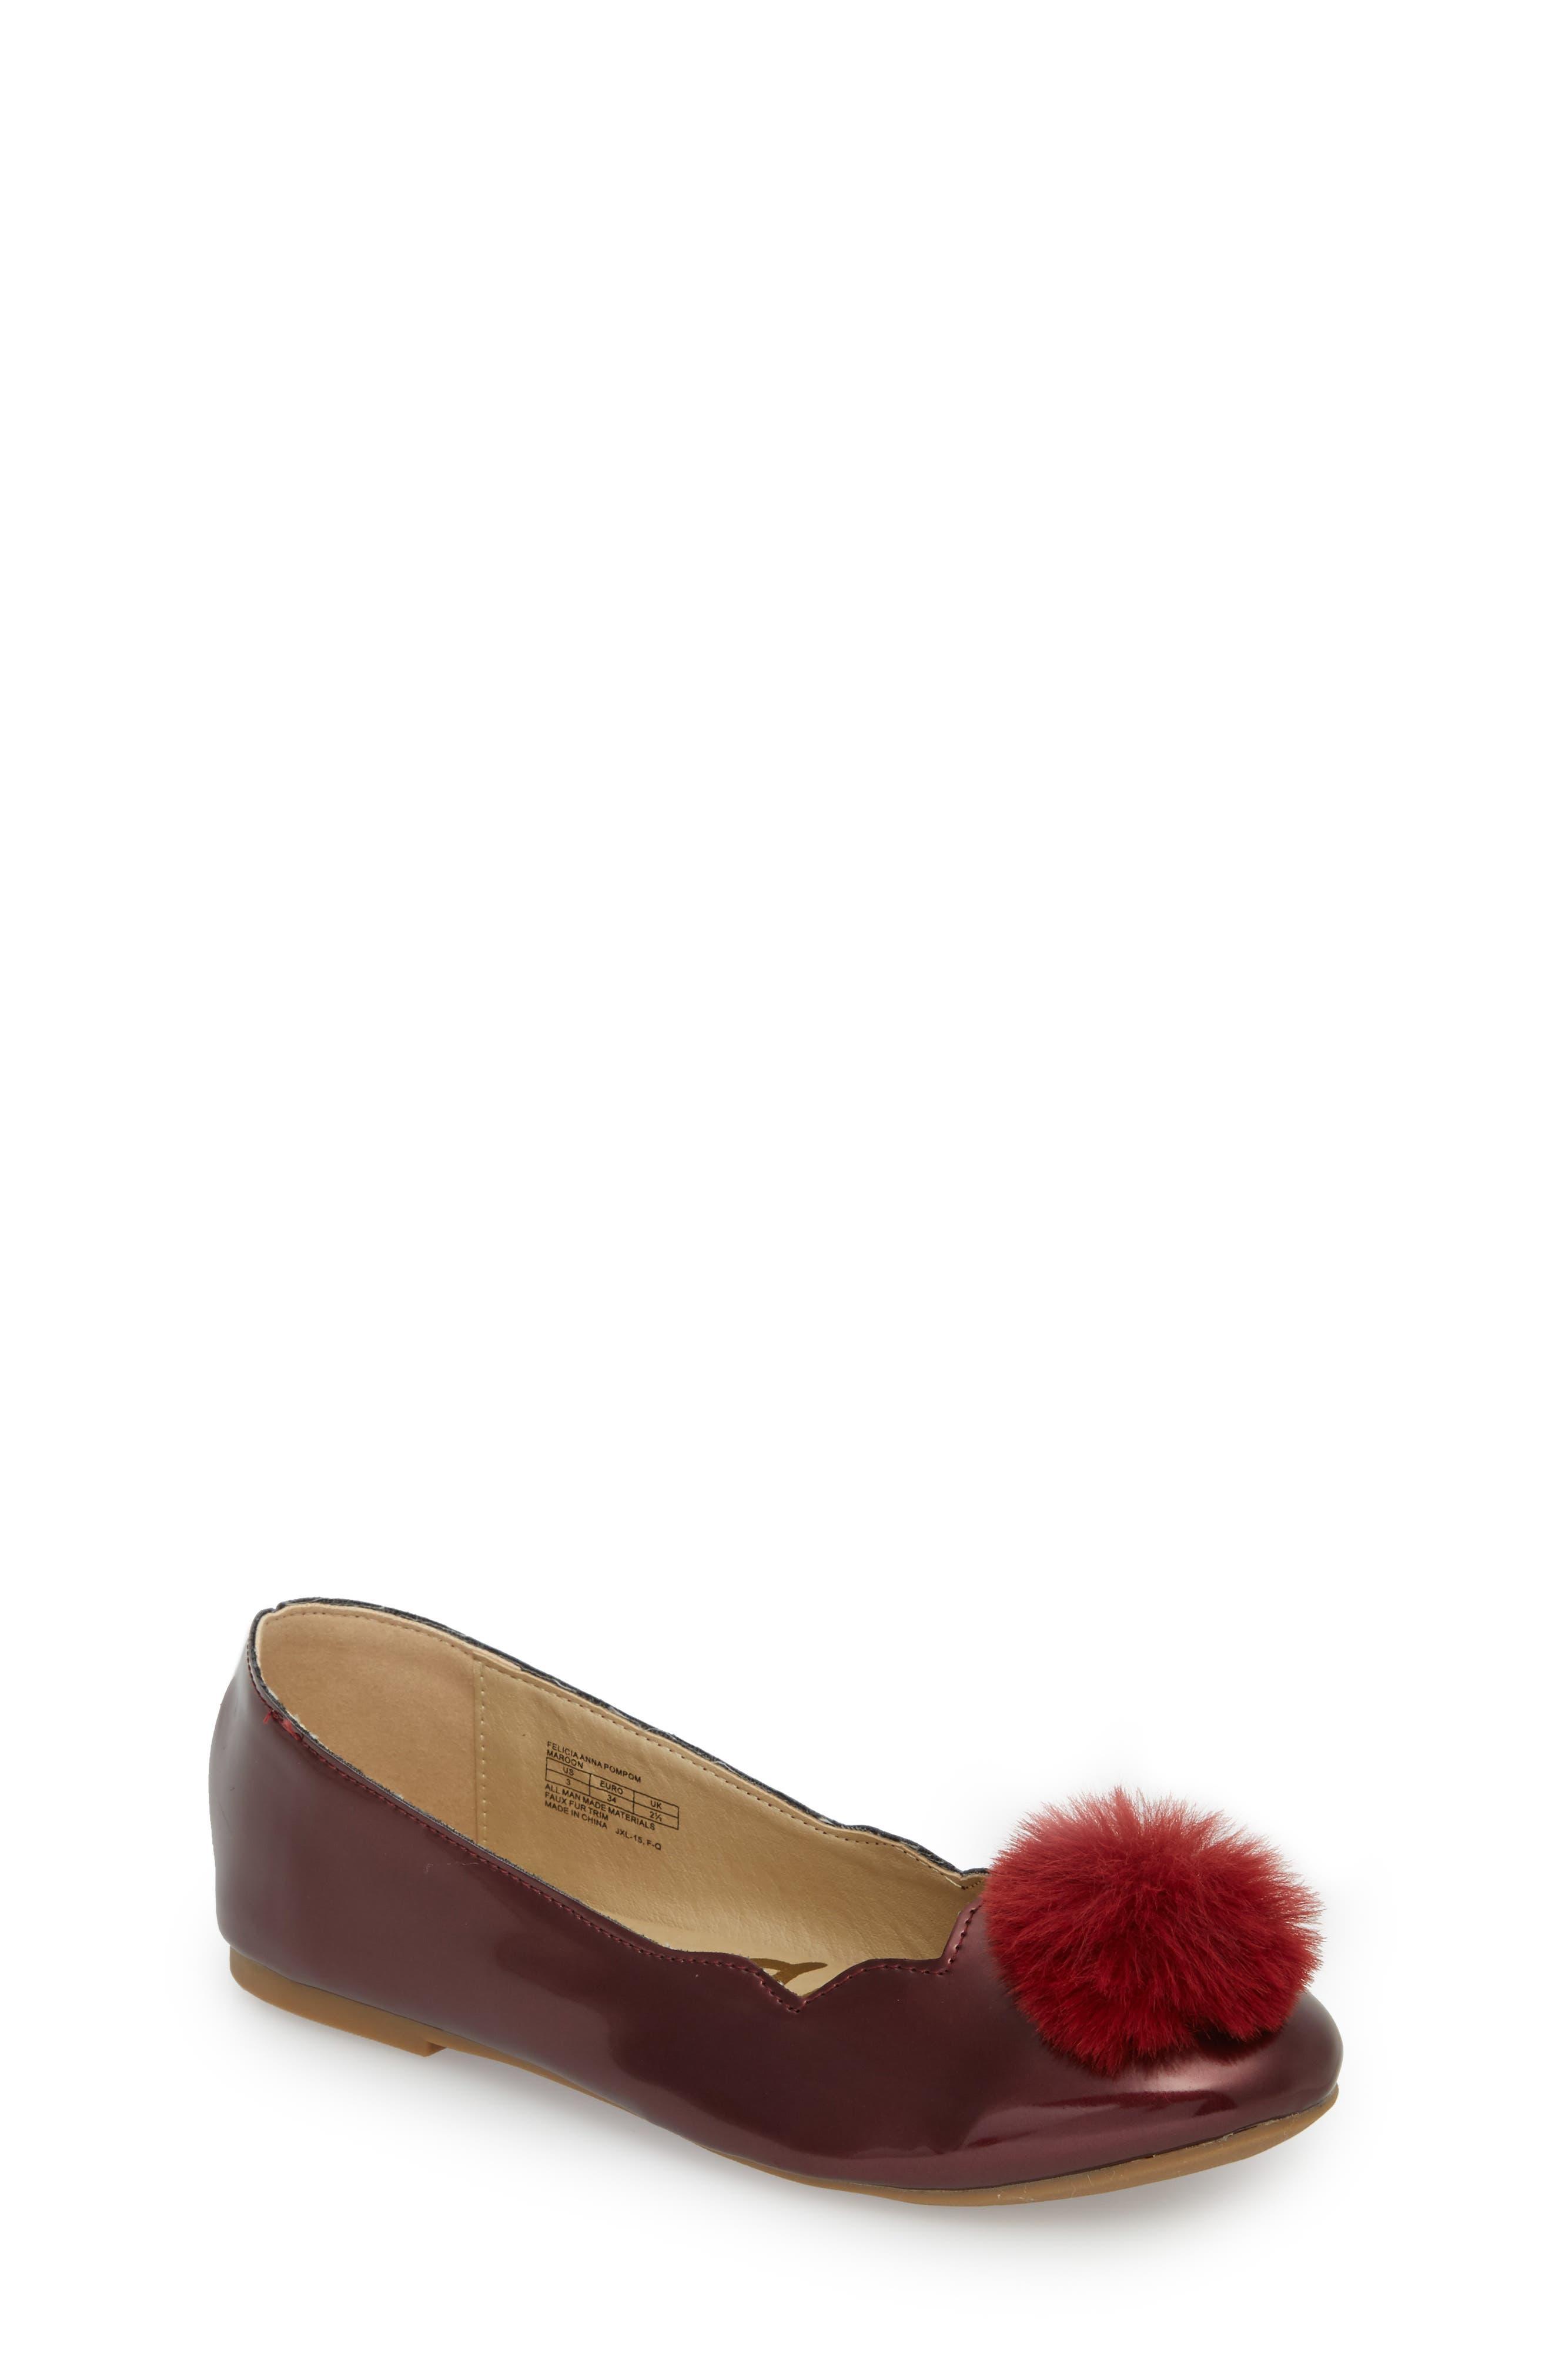 Felicia Anna Faux Fur Pom Flat,                         Main,                         color, Maroon